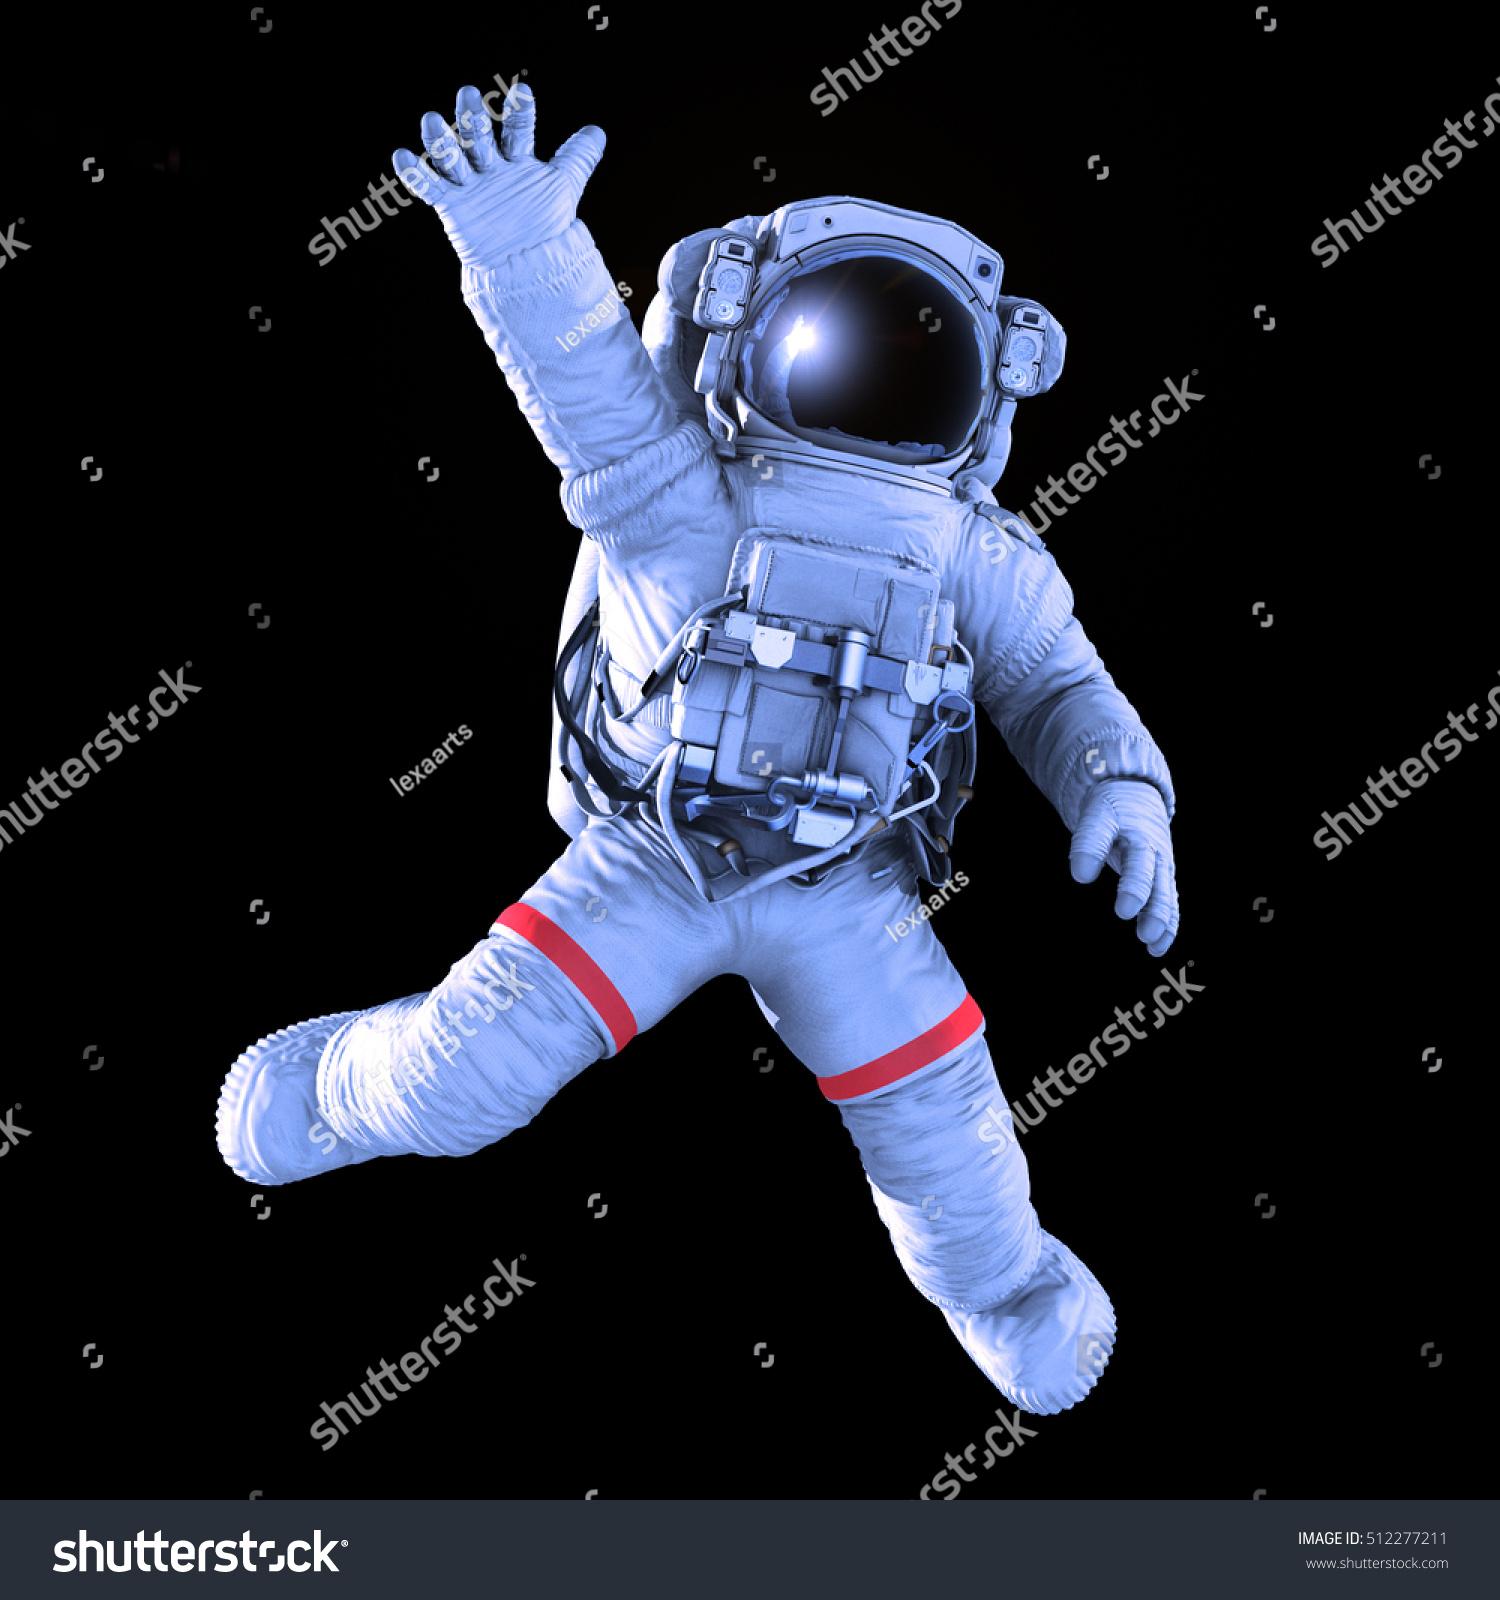 astronaut black background - photo #14